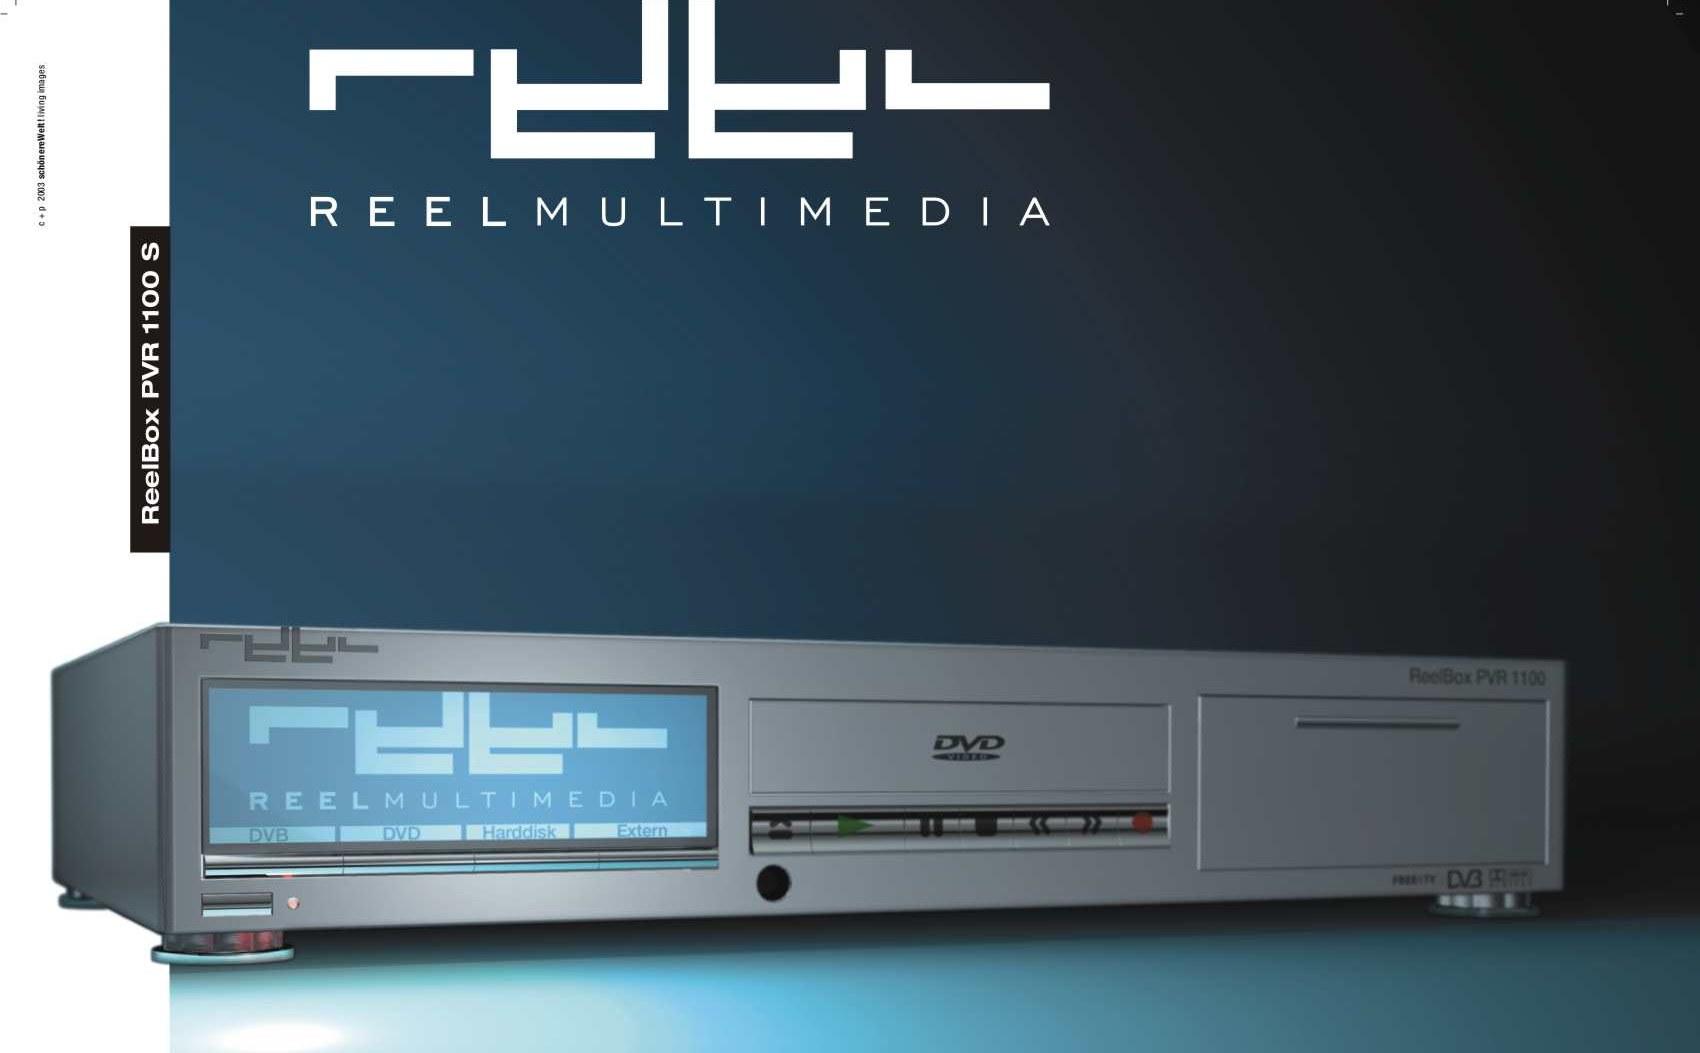 reel-multimedia-settop-box-brand-design